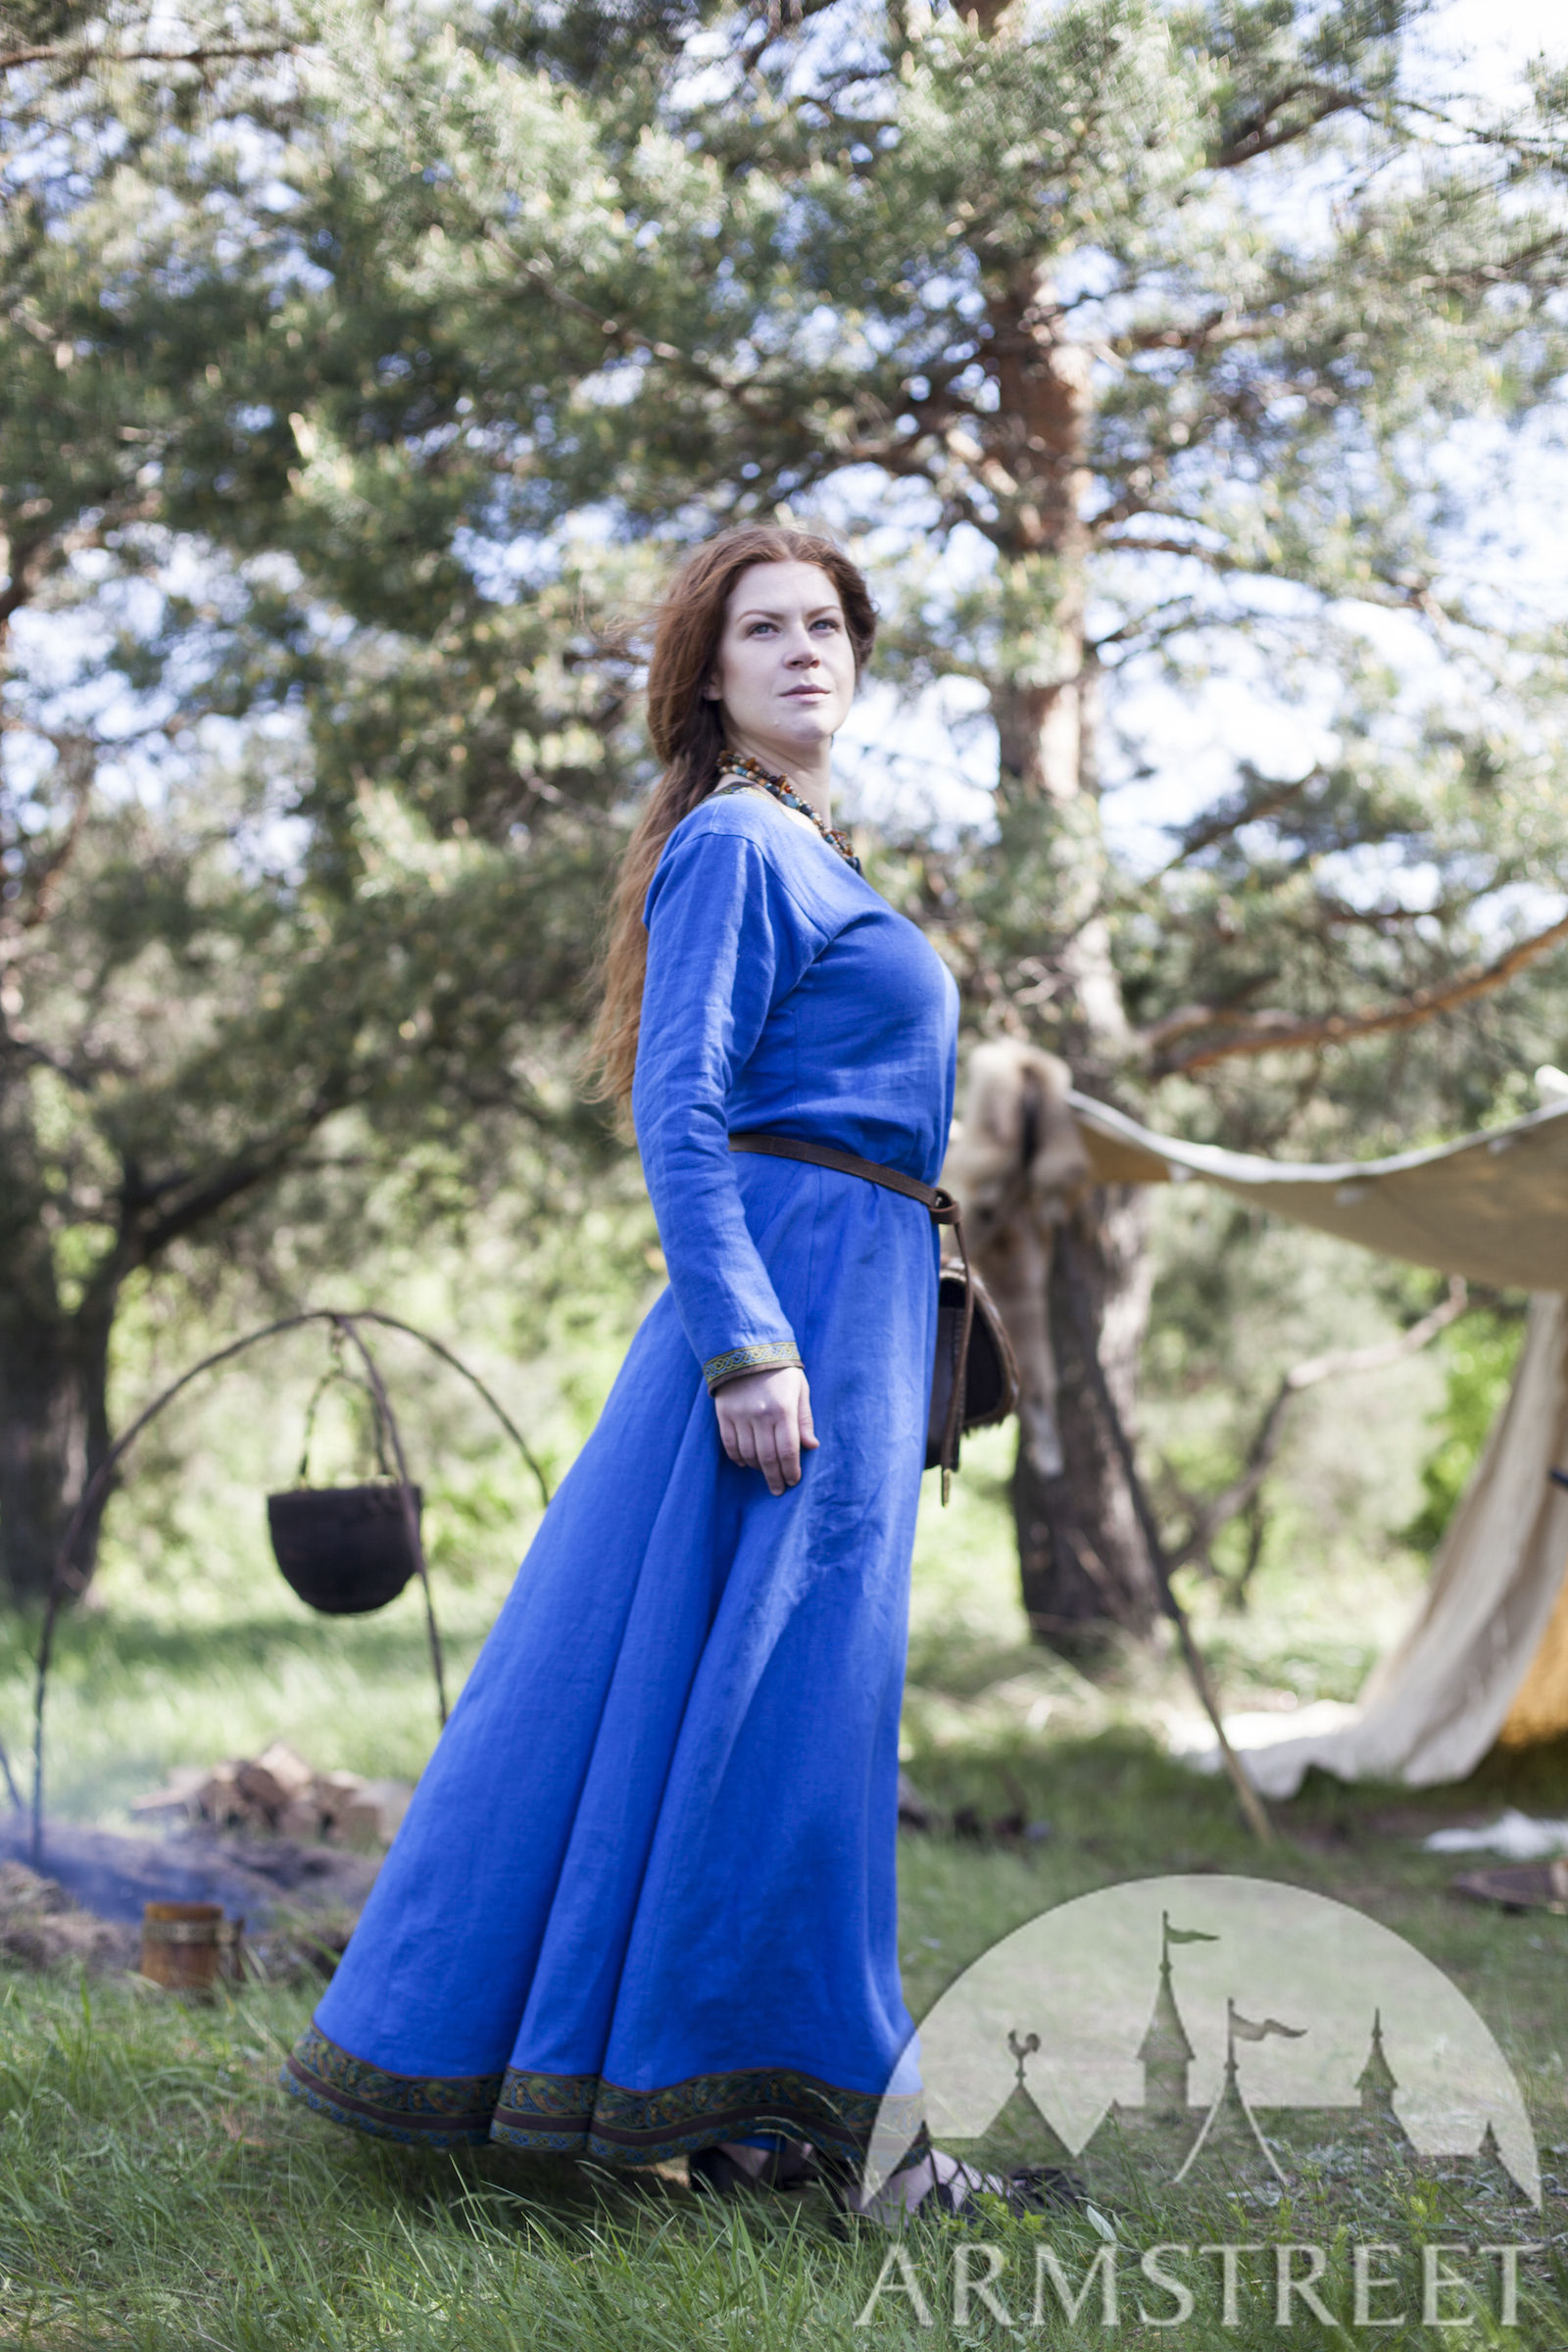 naturel vert lin du la » lin avec ancienne lin en brun tablier Ingrid vendre Disponible à viking lin « Maîtresse lin bleu Robe vert foyer lin bleu x8RwBY